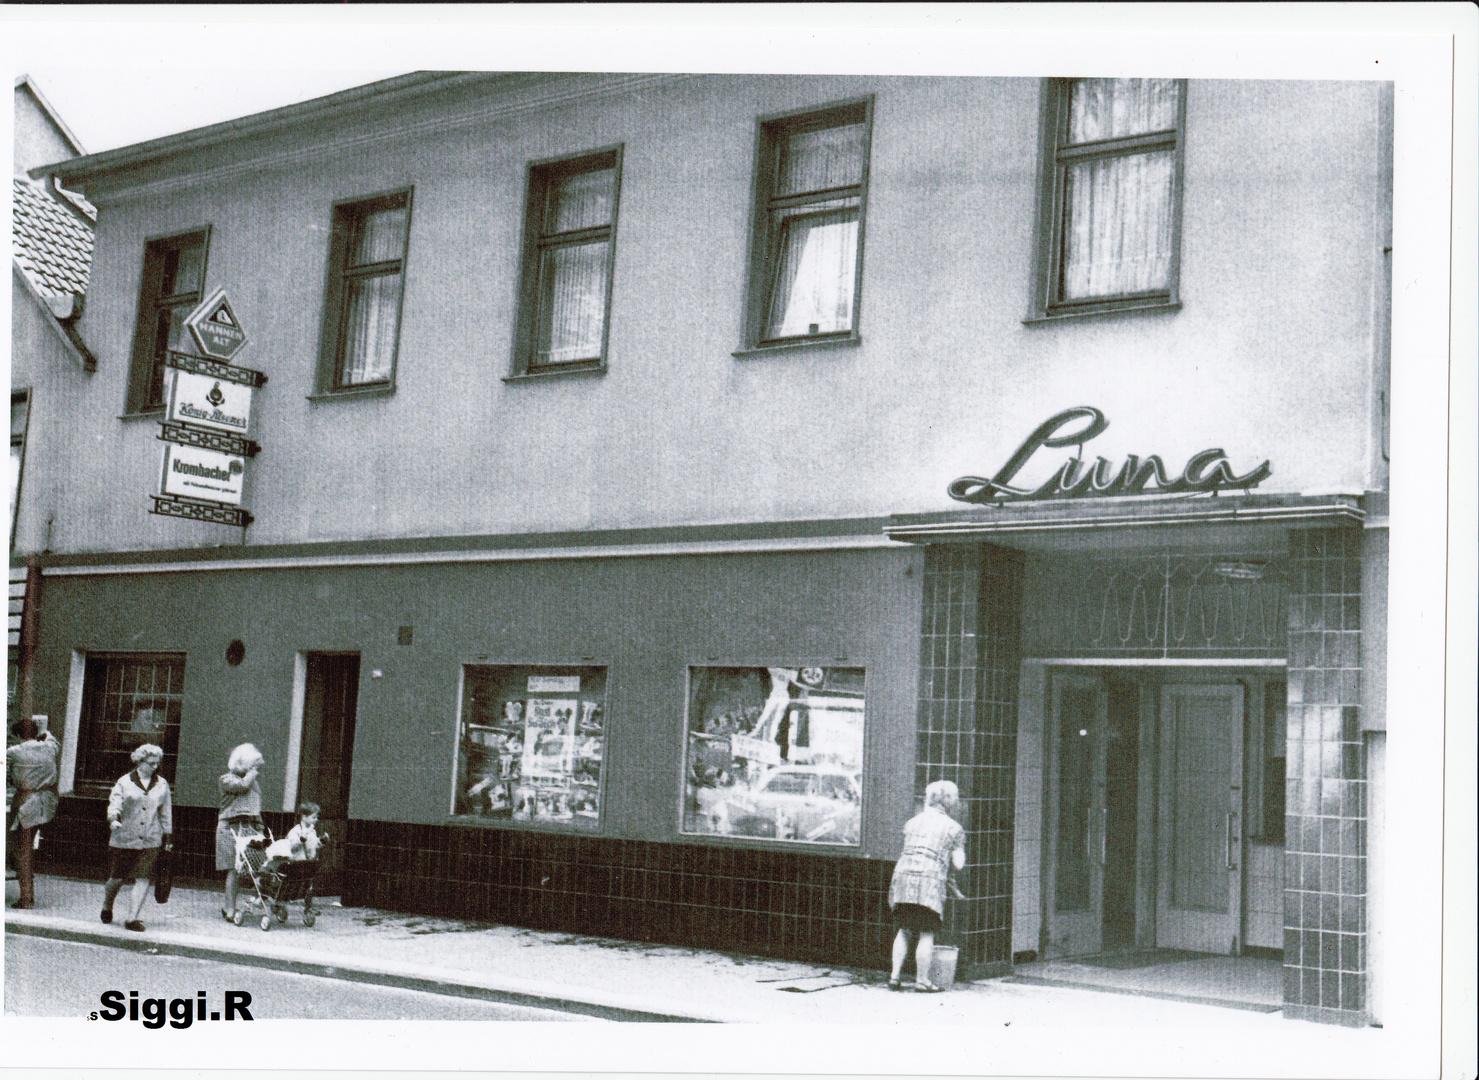 Das alte Luna-Kino in Essen-Steele